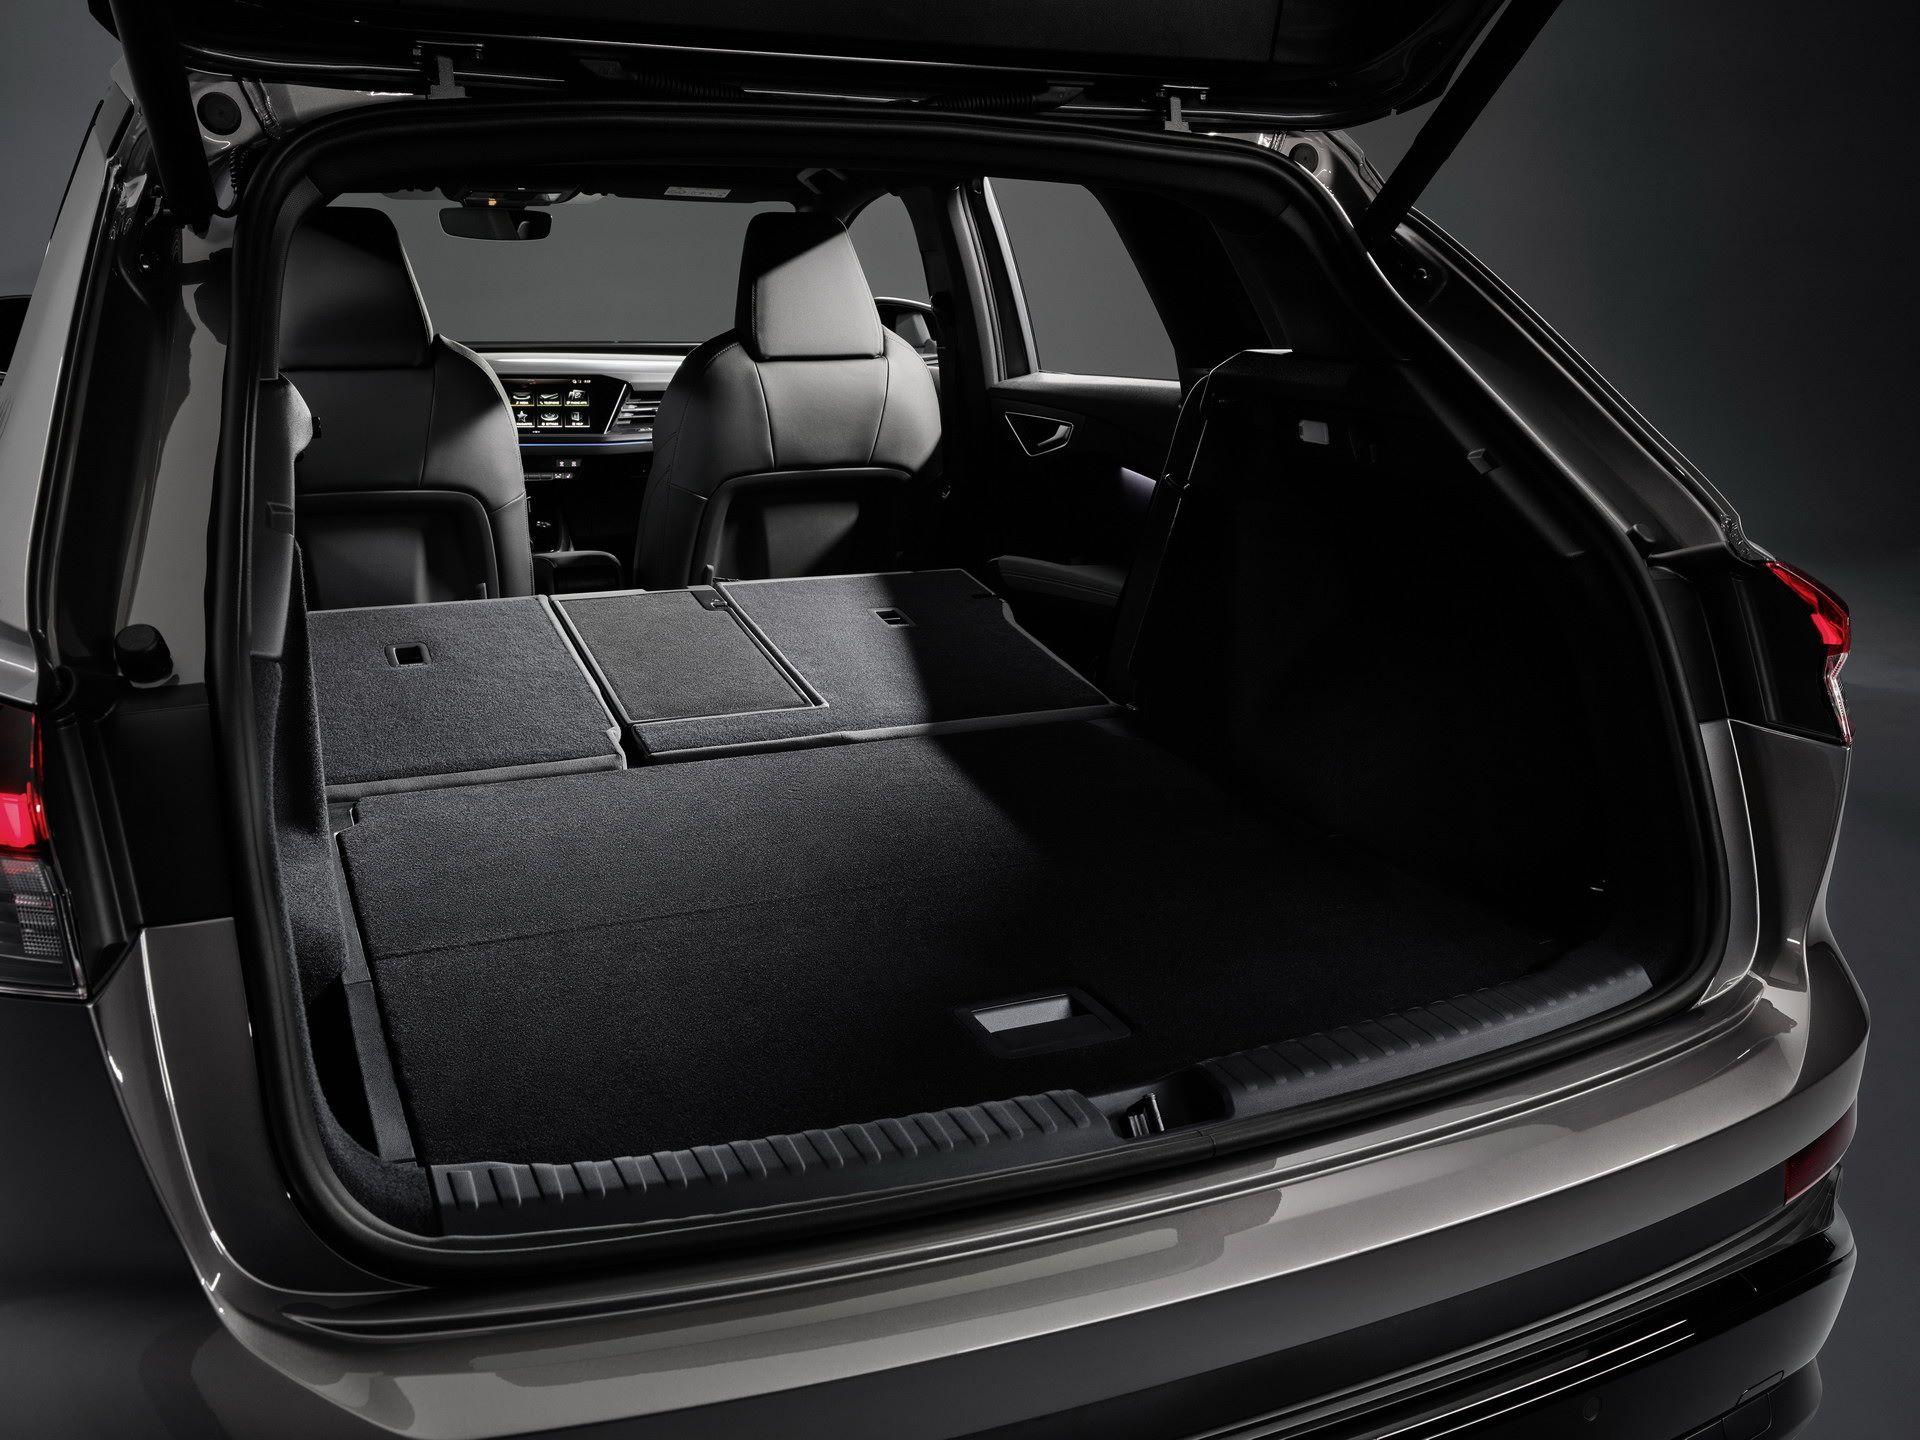 Audi-Q4-e-tron-and-Q4-e-tron-Sportback-79